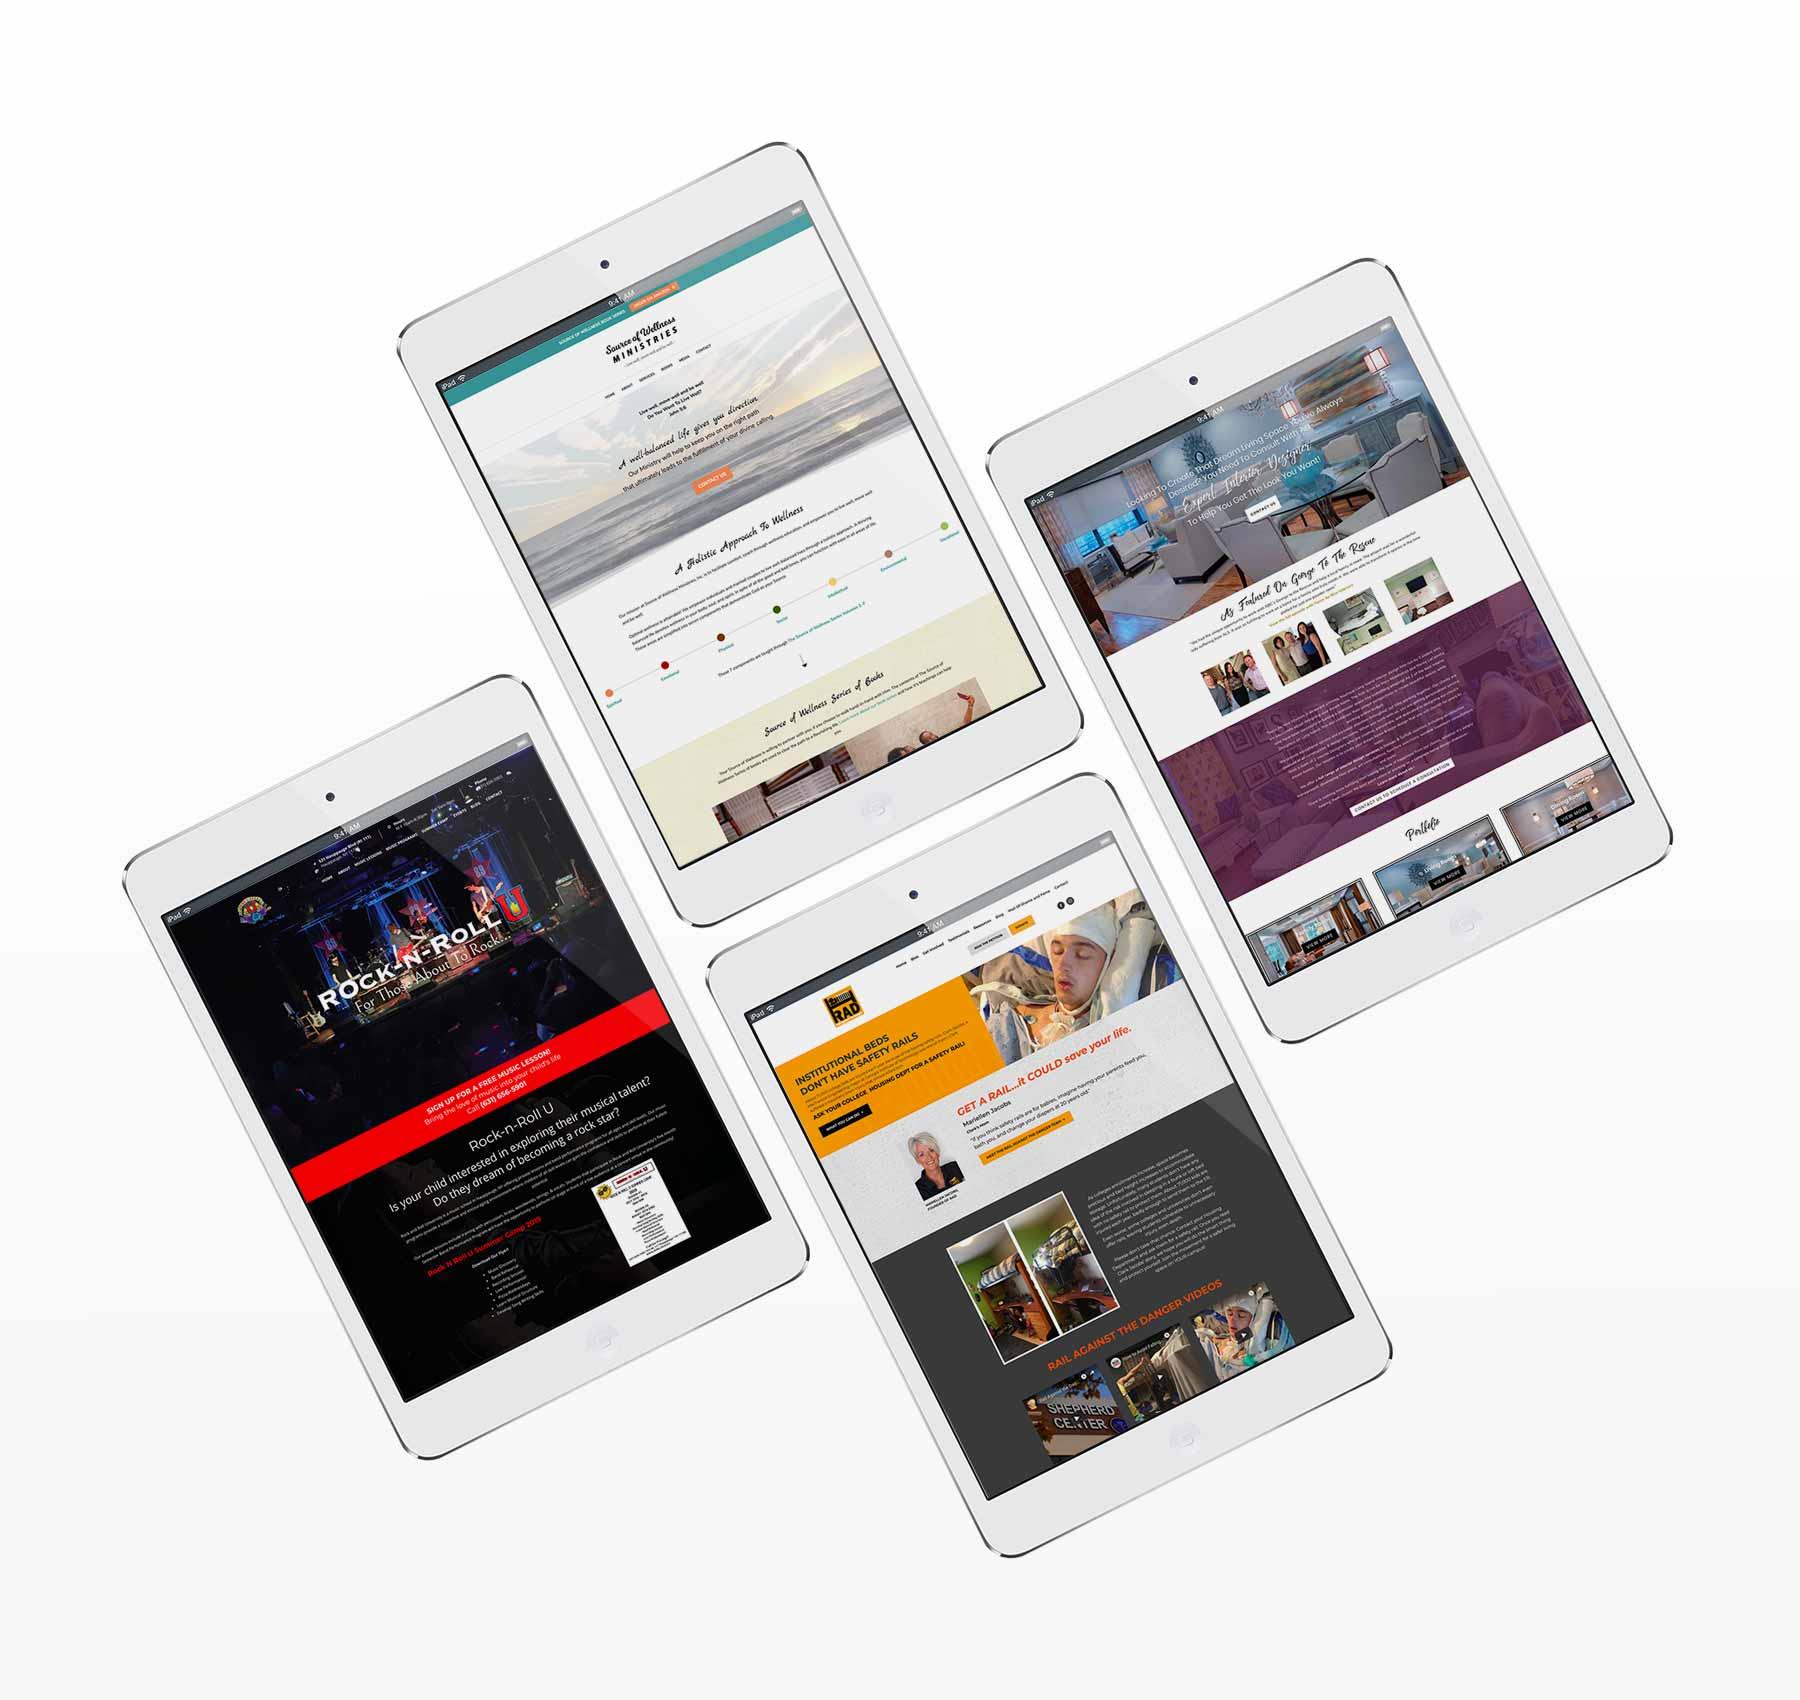 Photo of 4 tablet mockups of responsive design.